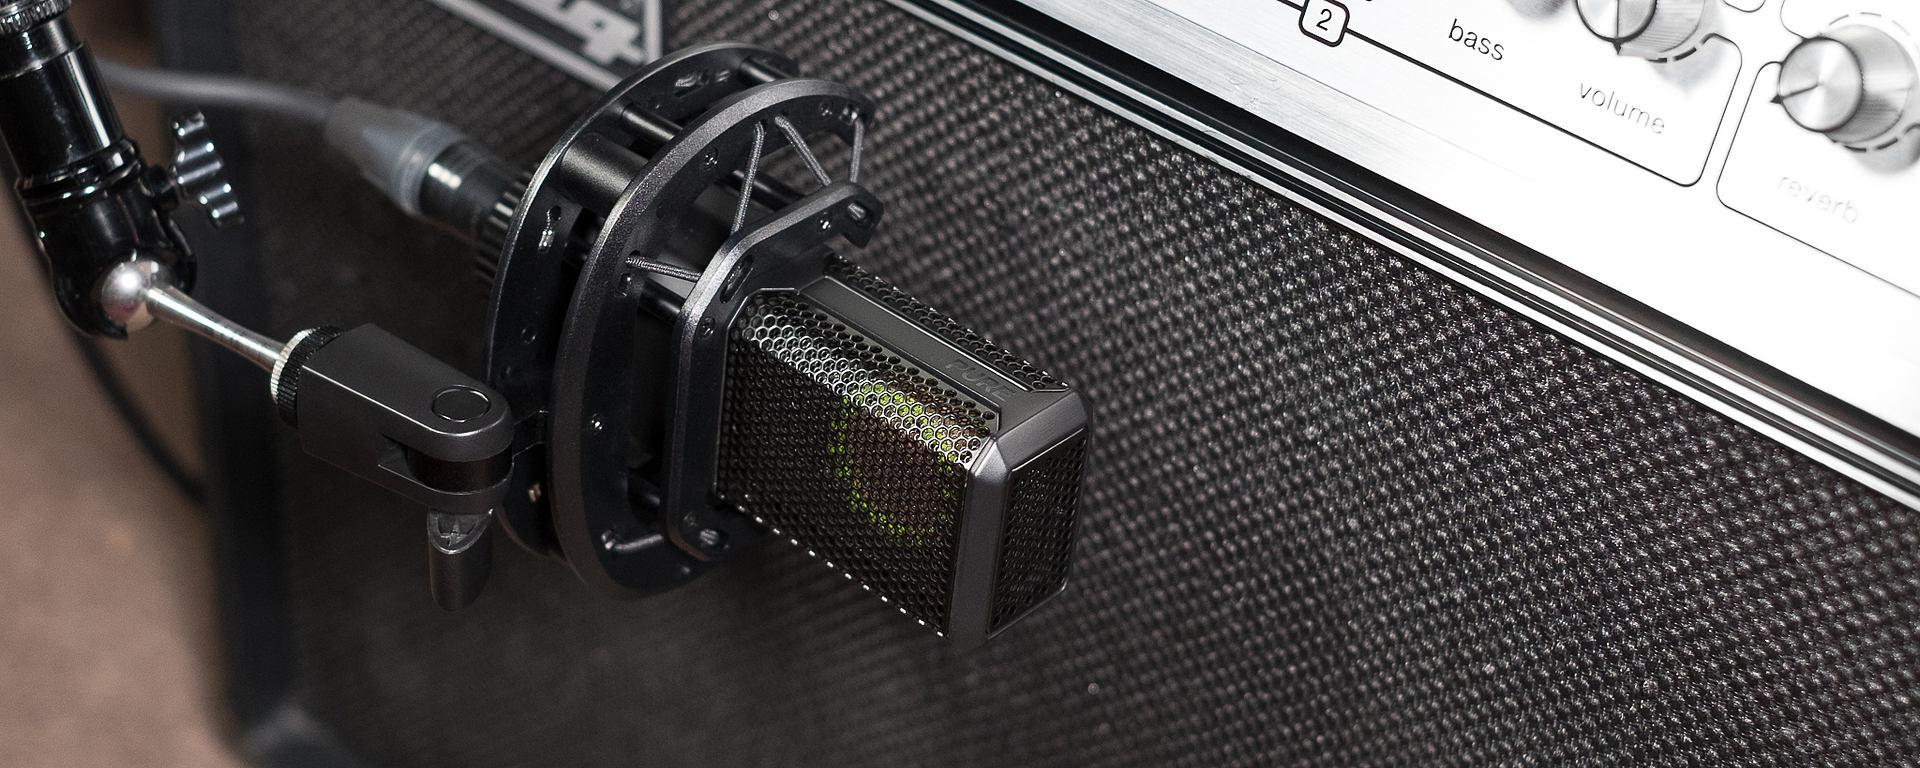 LCT 440 PURE workhorse studio mic